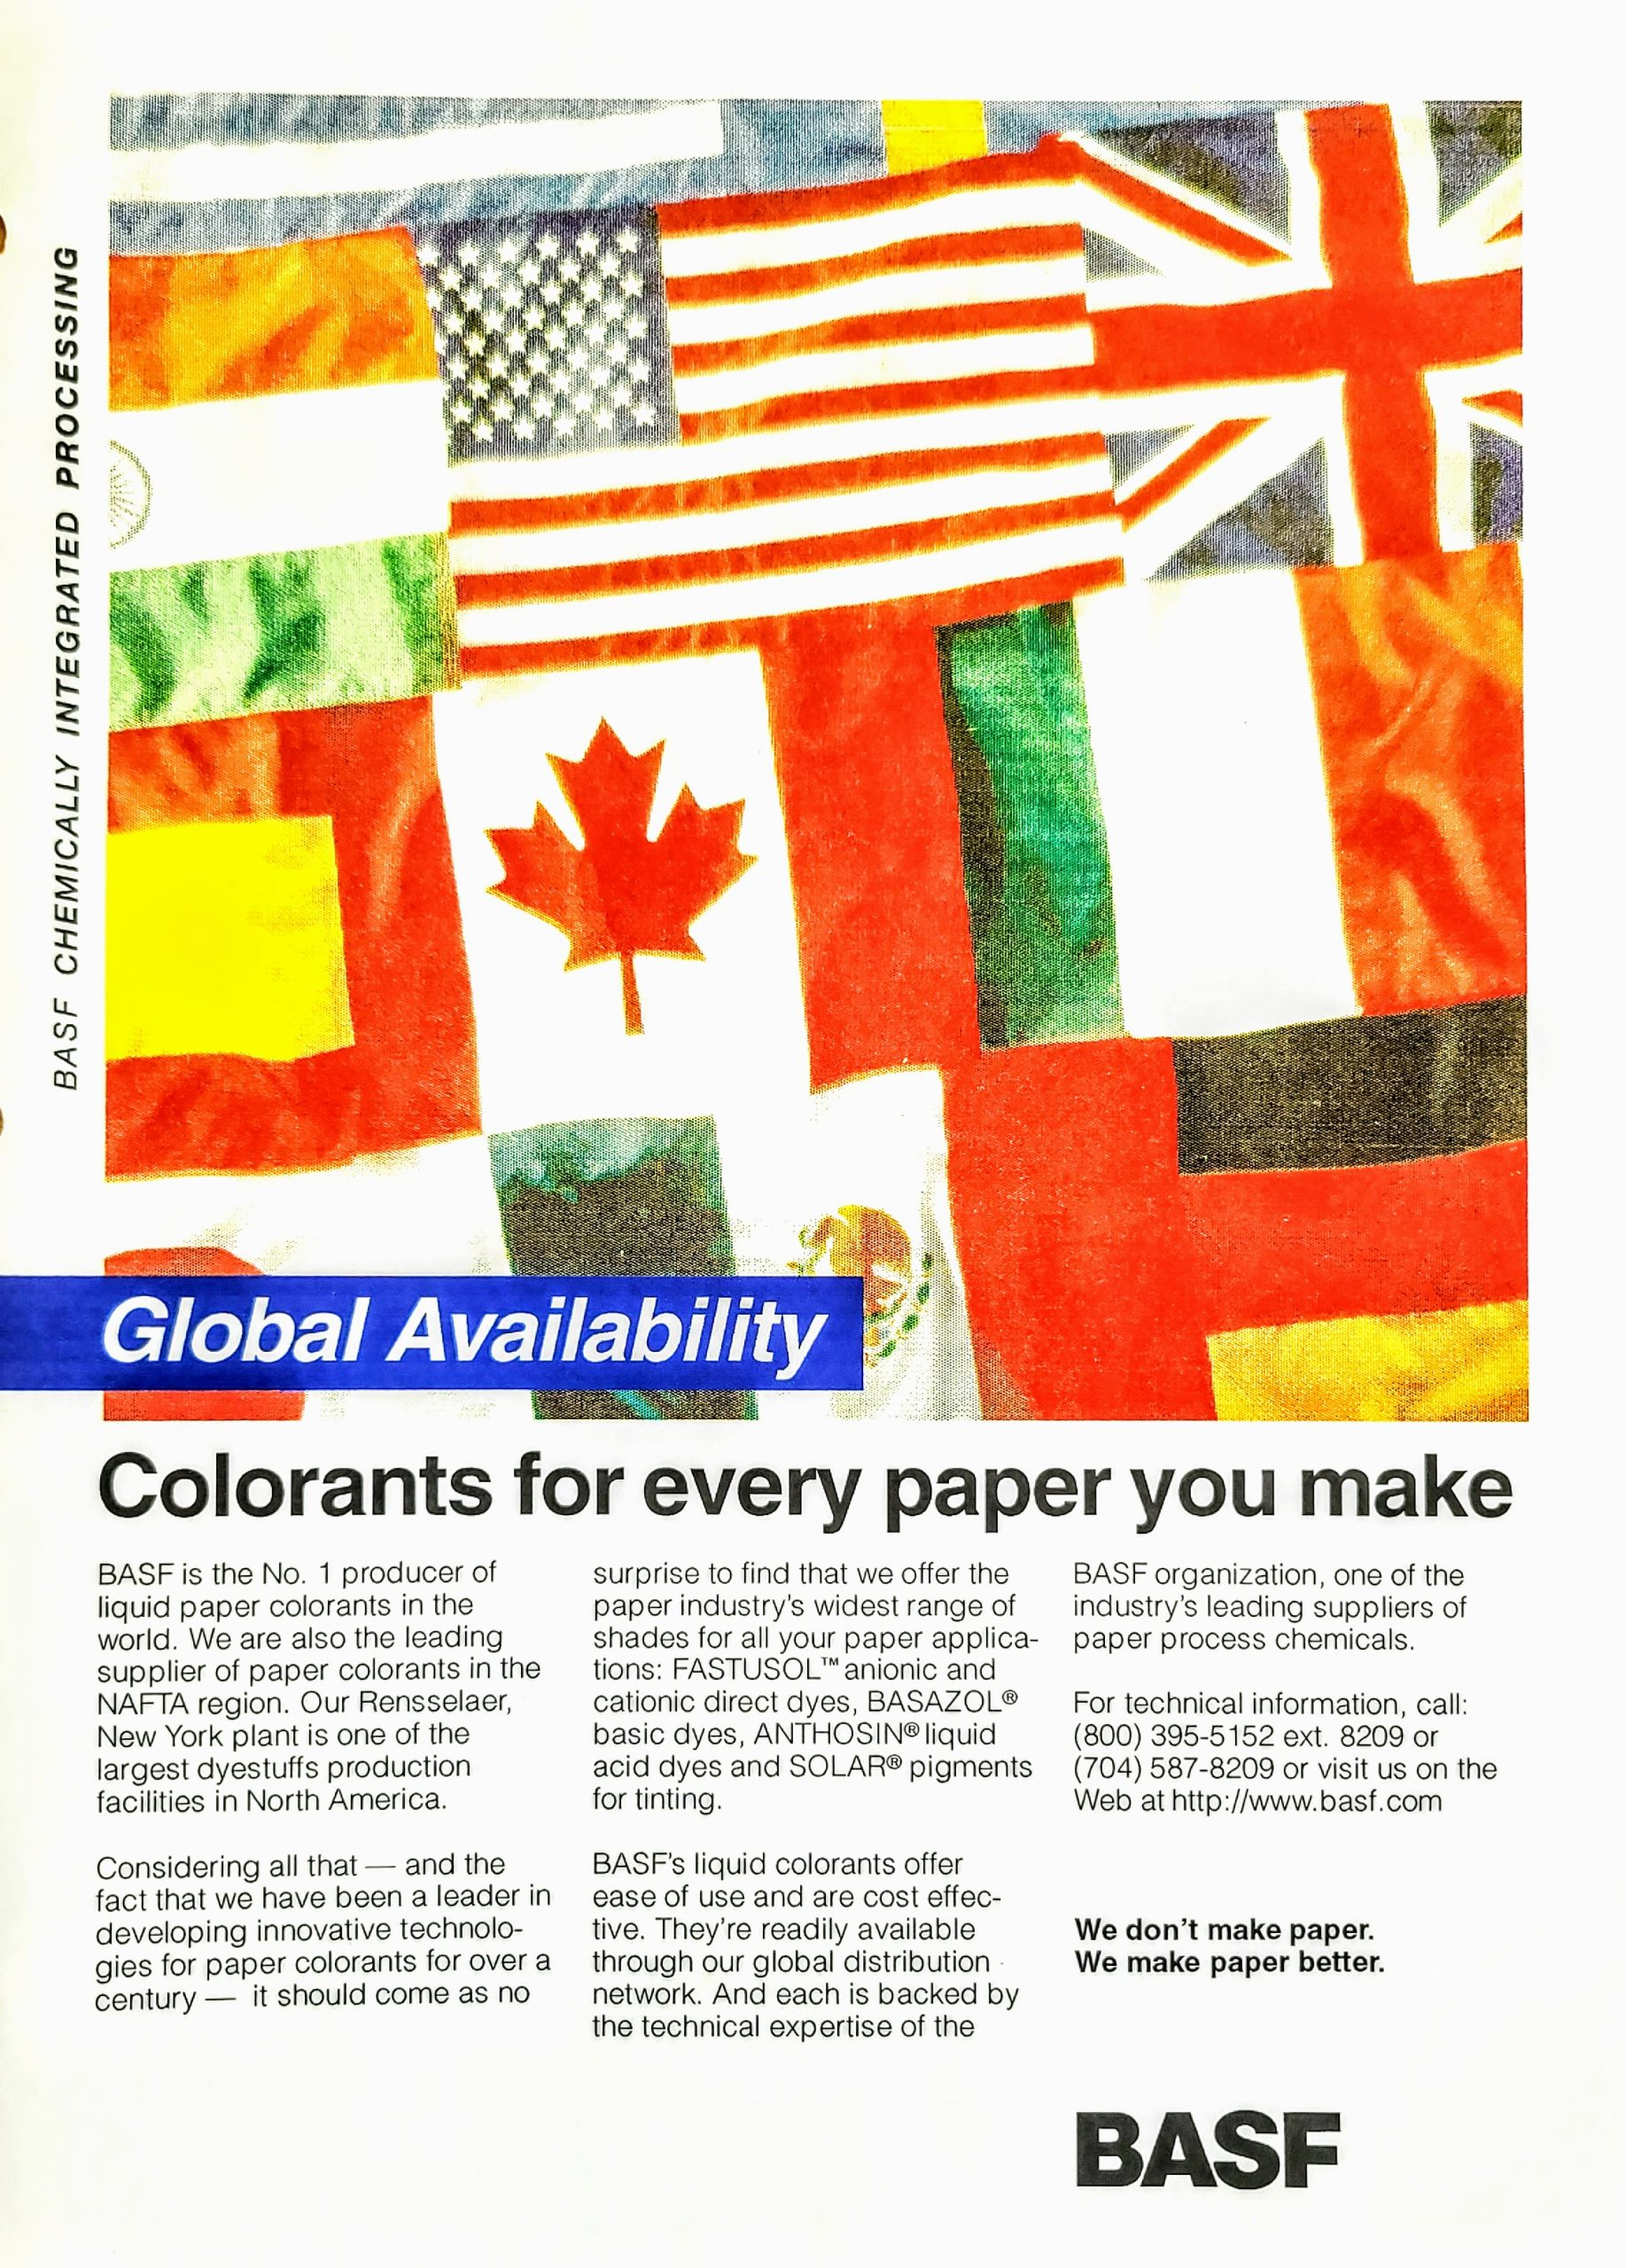 basf_colorants_global availability_ad_16